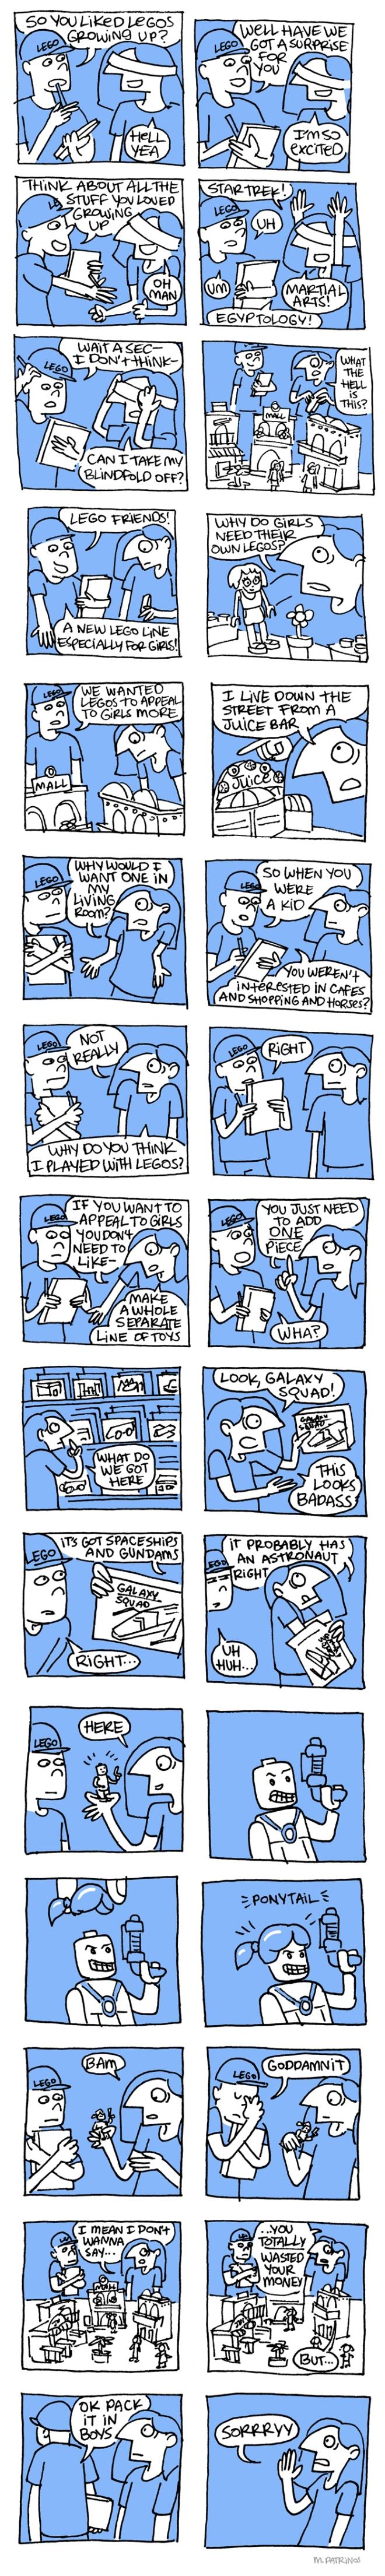 2014-12-06-Lego-Friends